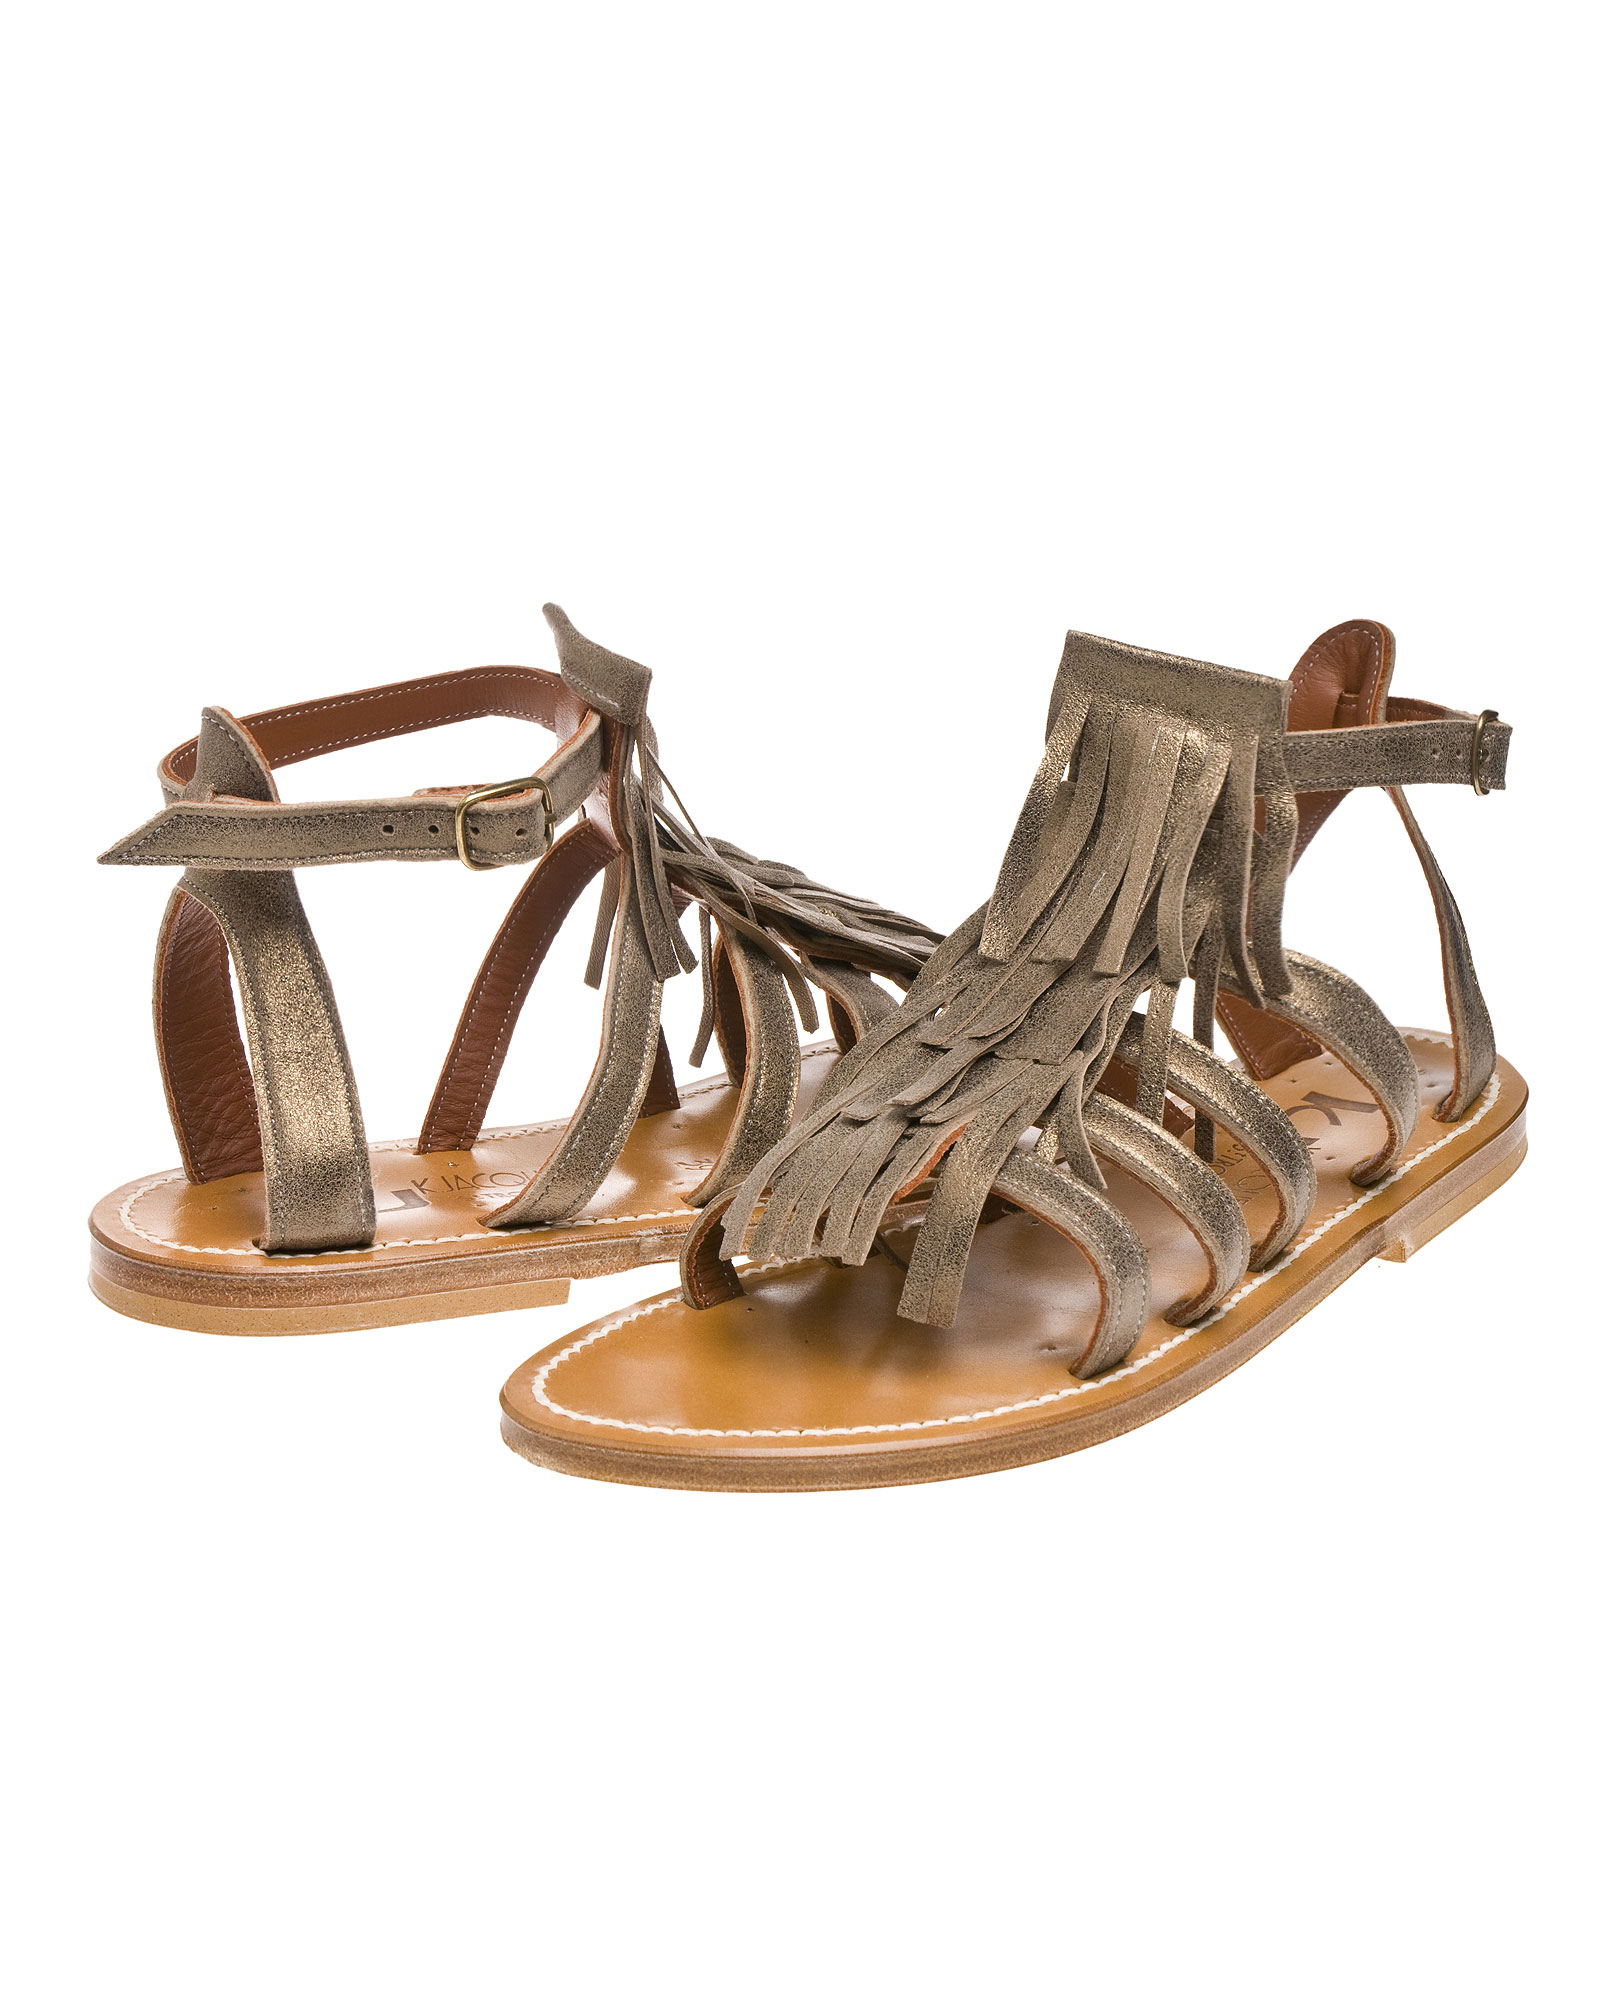 fringe sandals - Metallic K.Jacques Hot emx0zQbD7